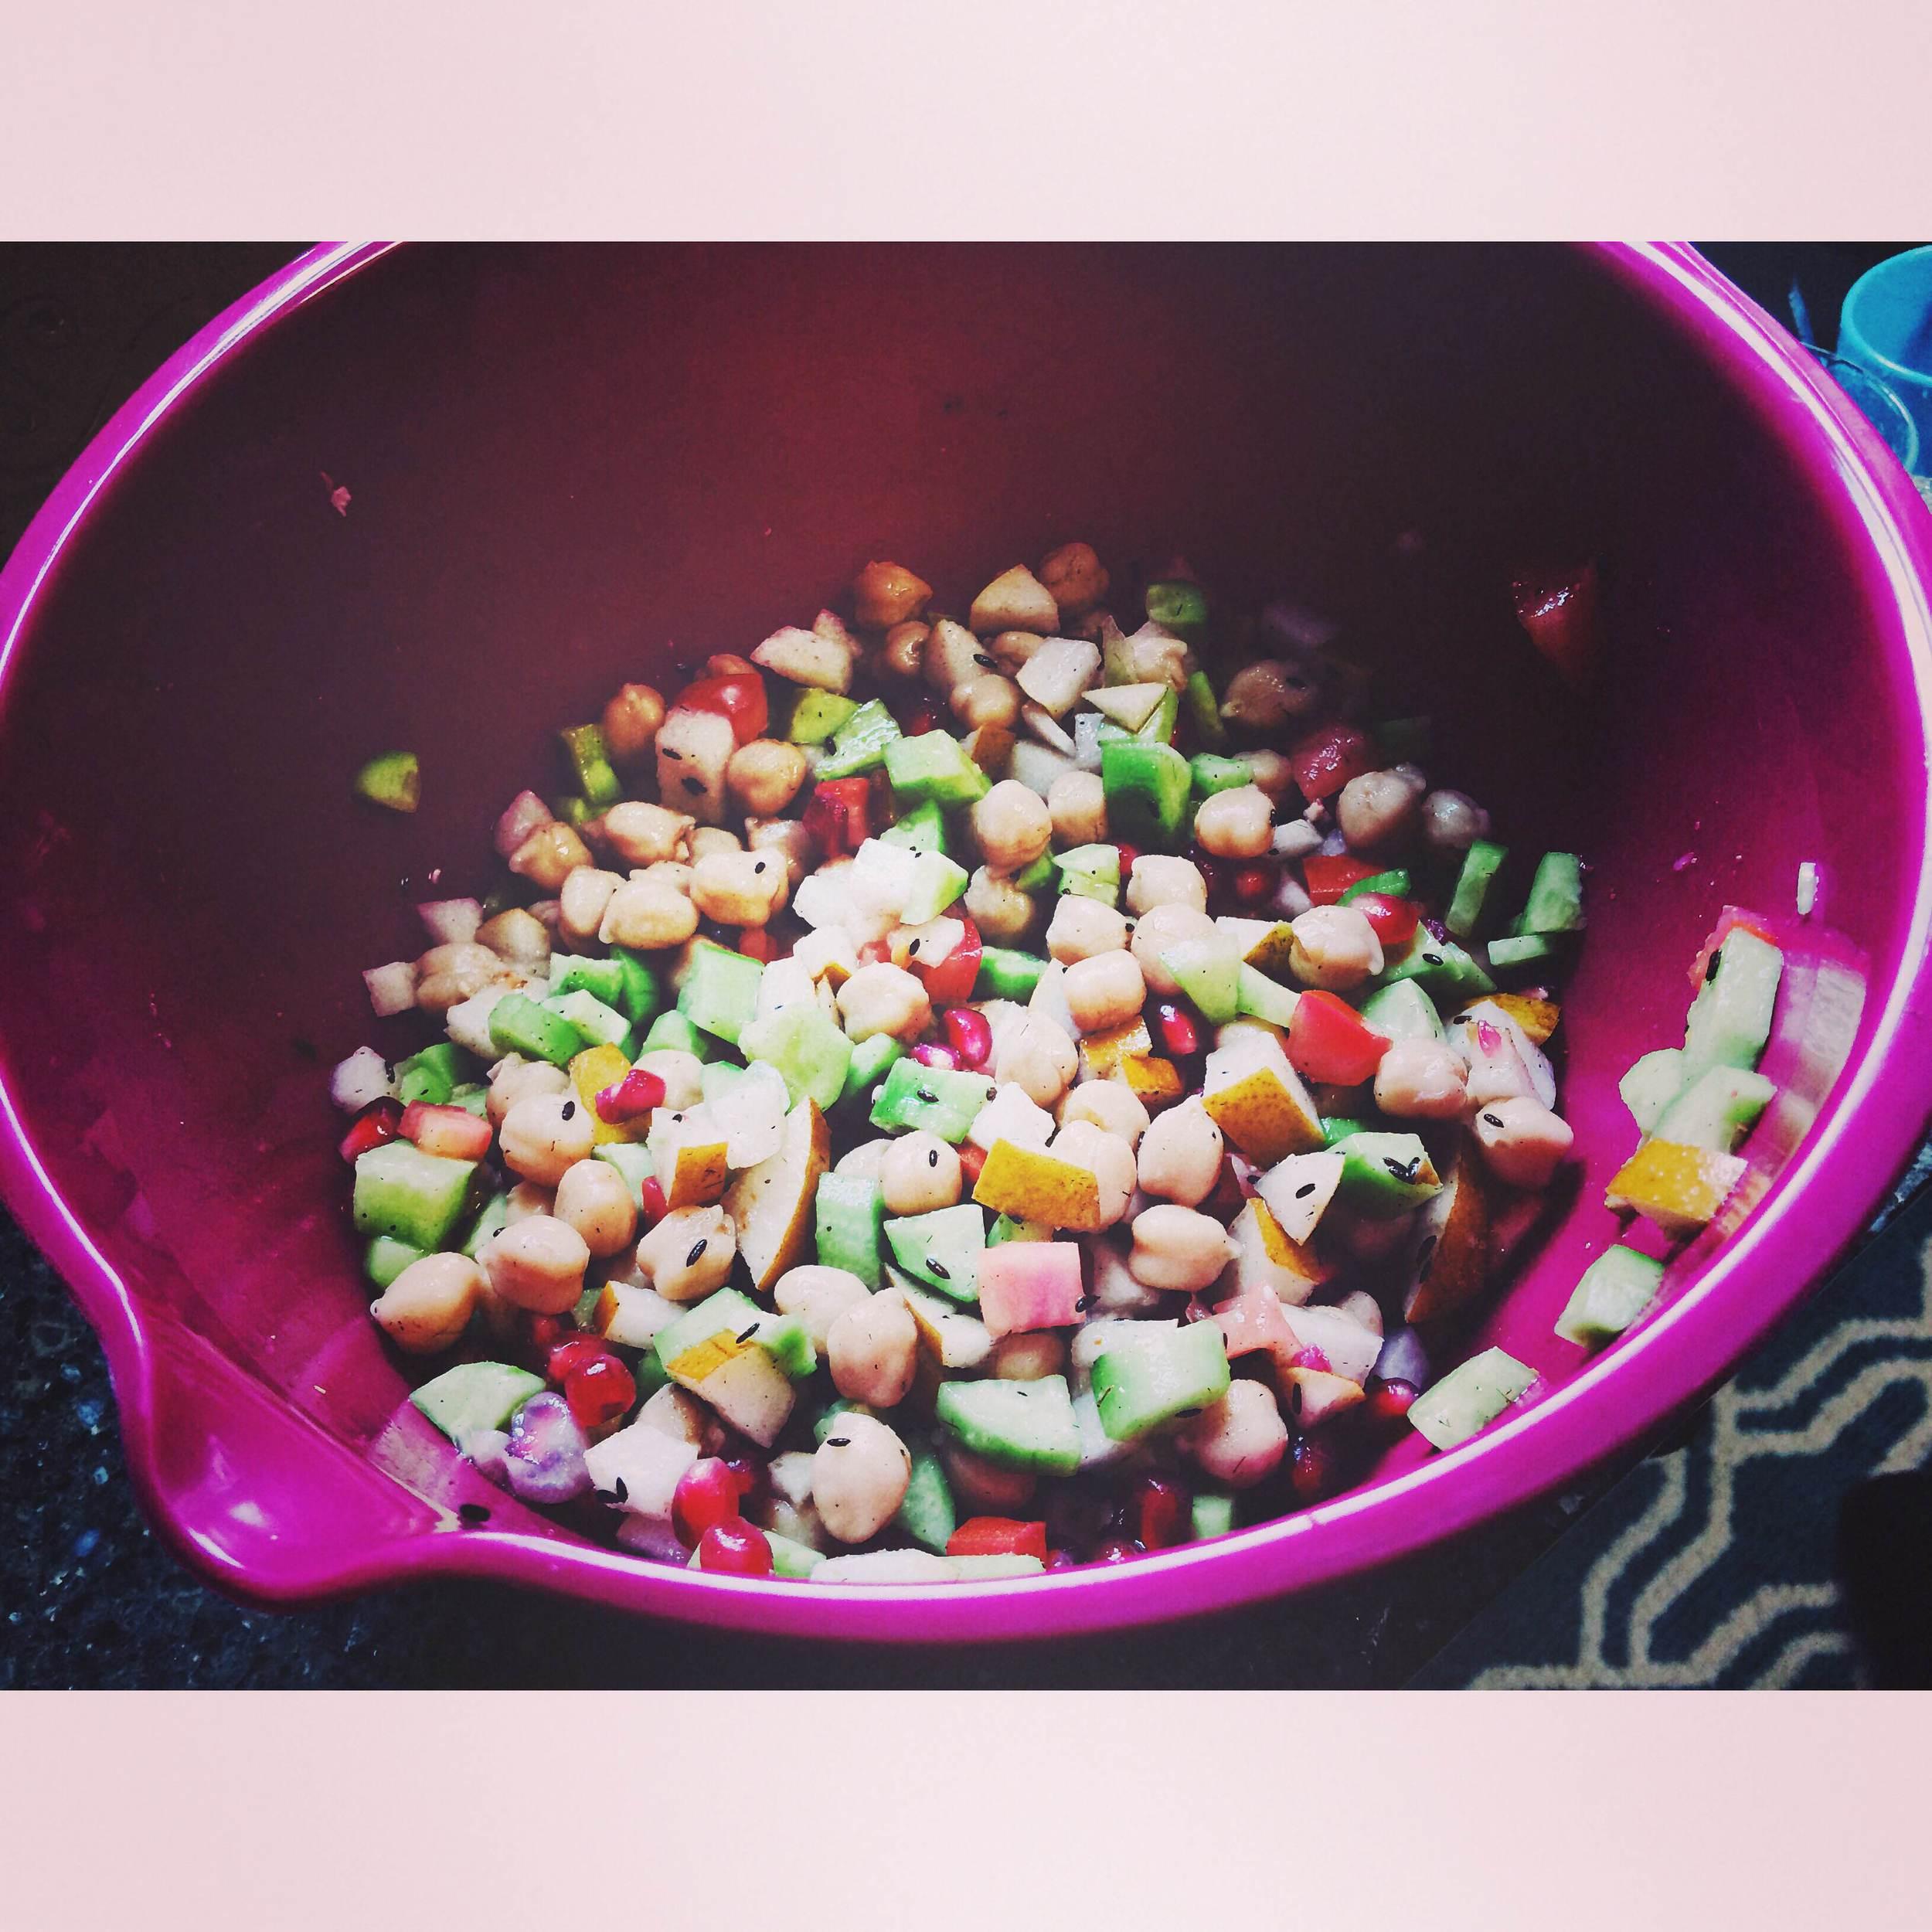 Fruite and Vegetable Salad